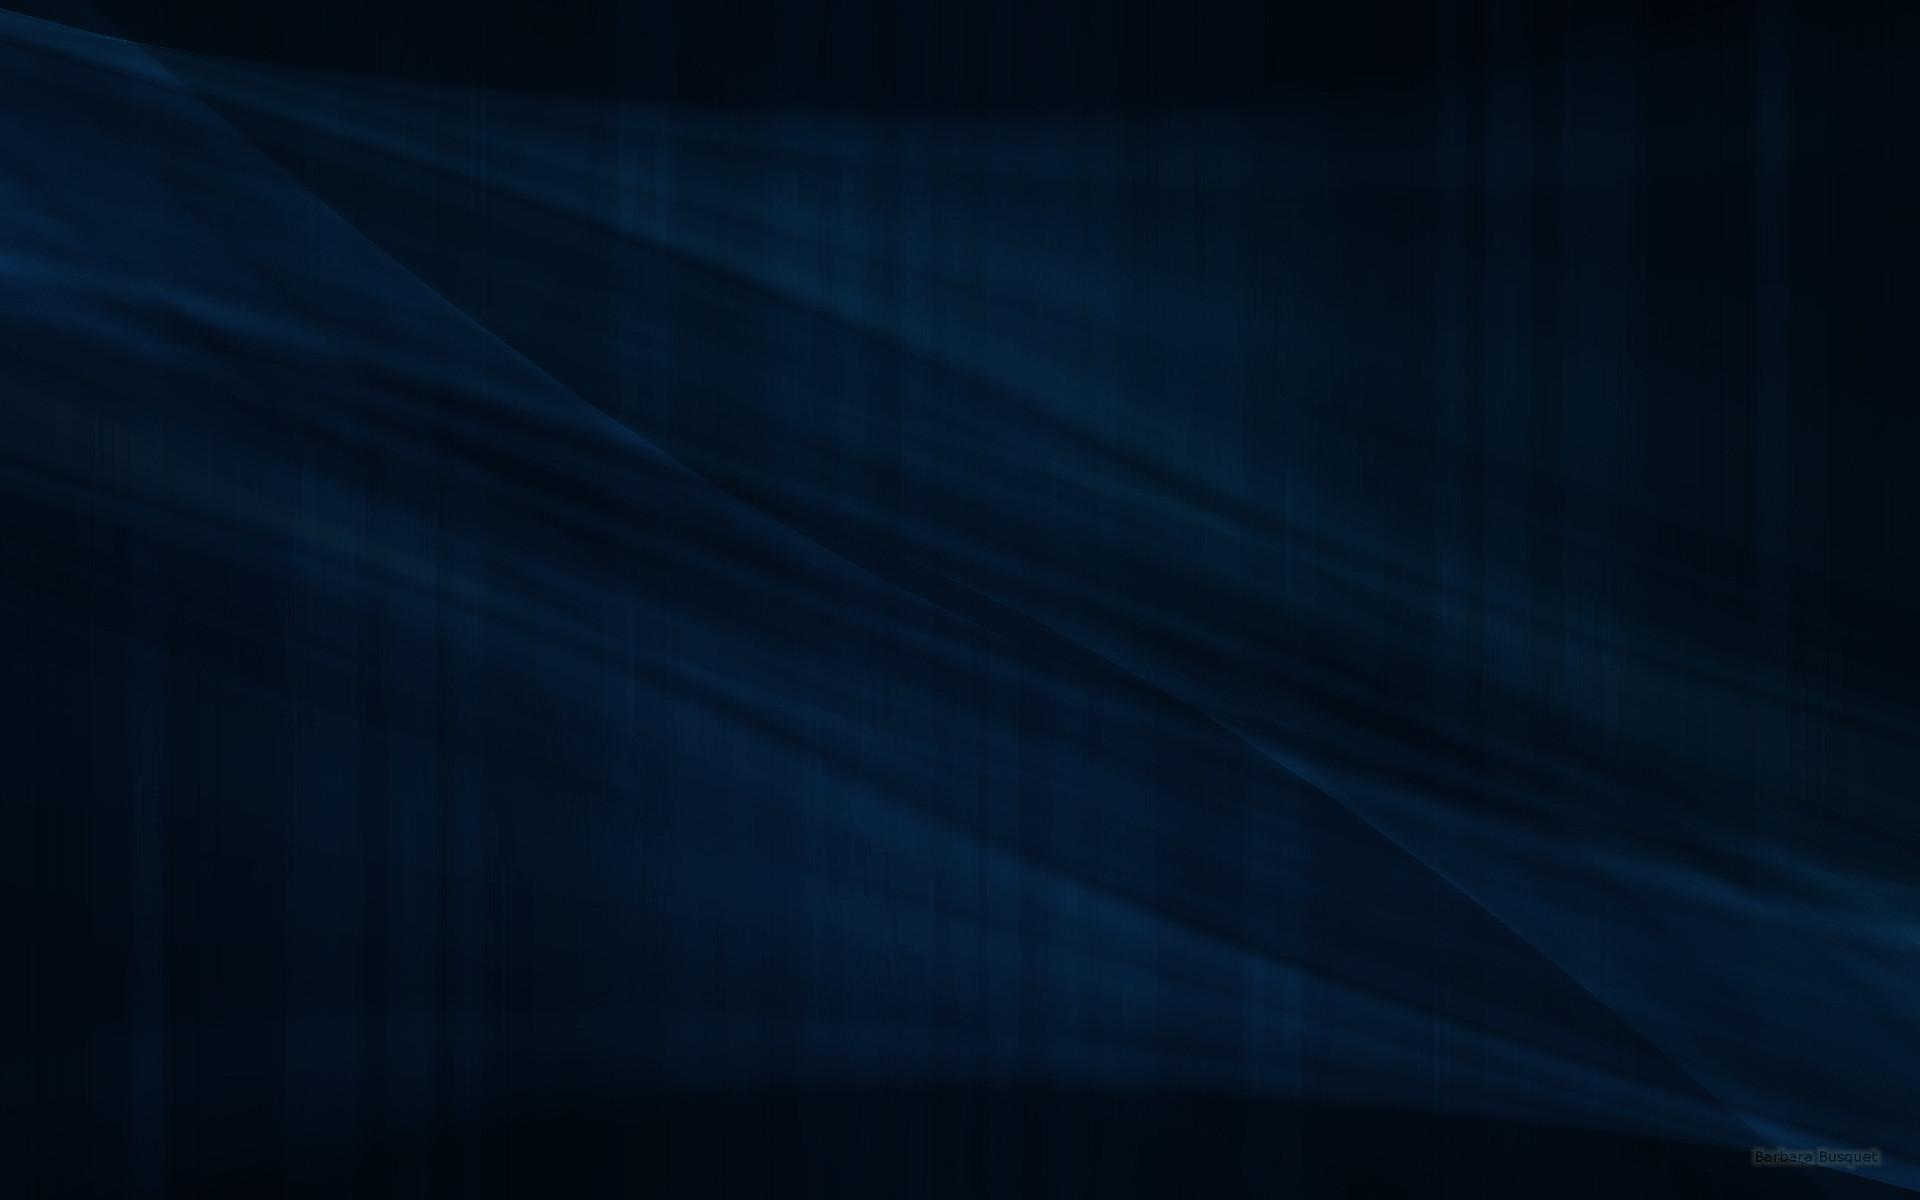 Dark blue vertical lines   Barbaras HD Wallpapers 1920x1200